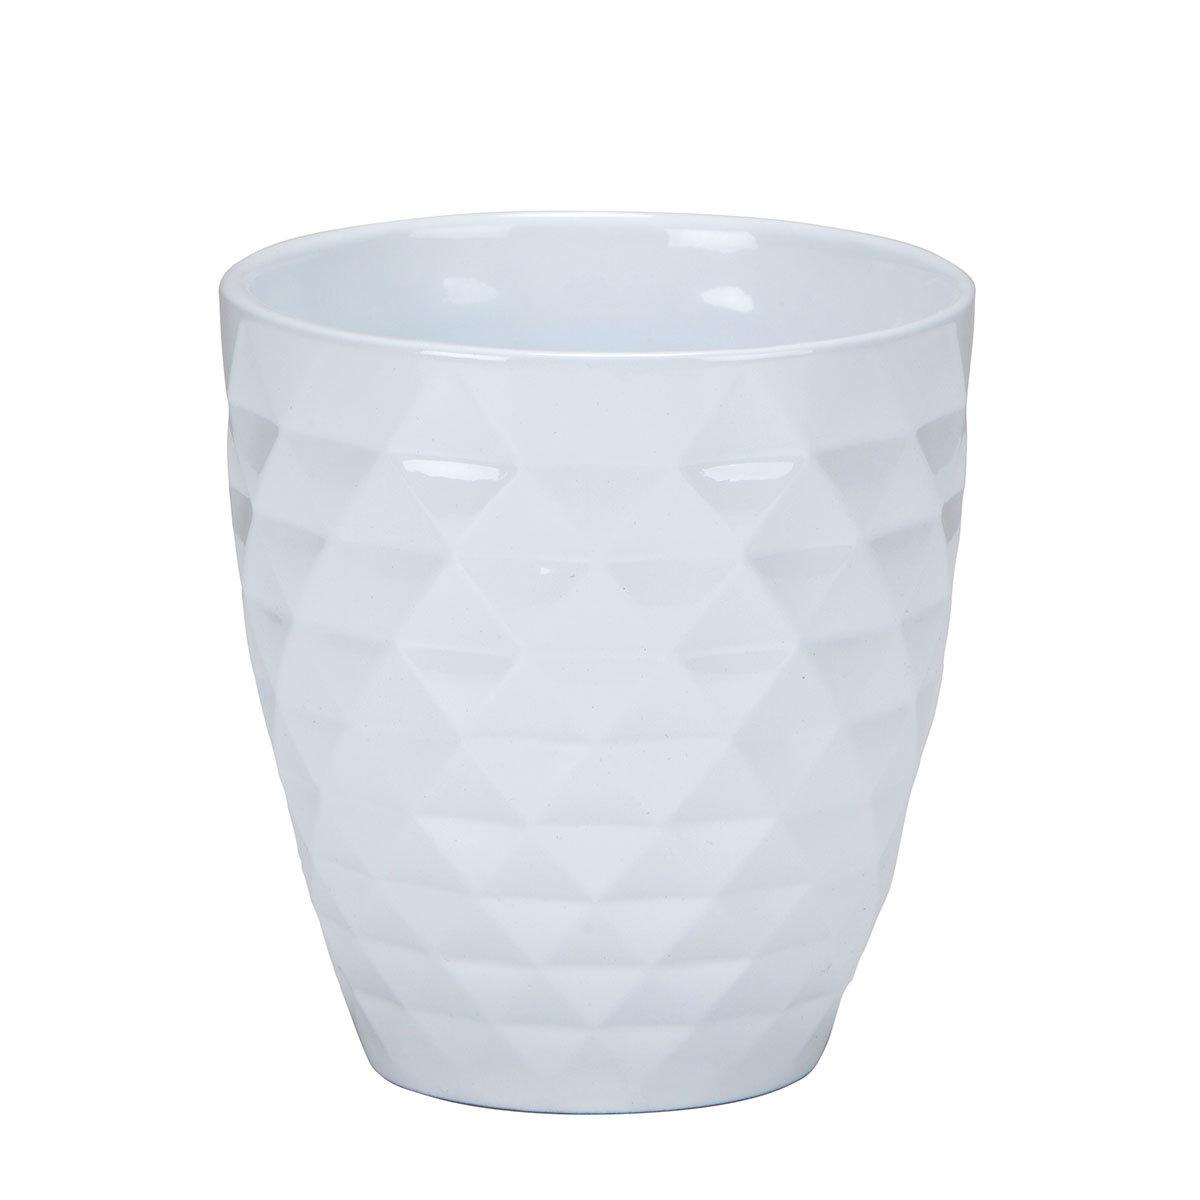 Keramik-Orchideengefäß Alaska, rund, 12,3x10x5x10,5 cm, weiß